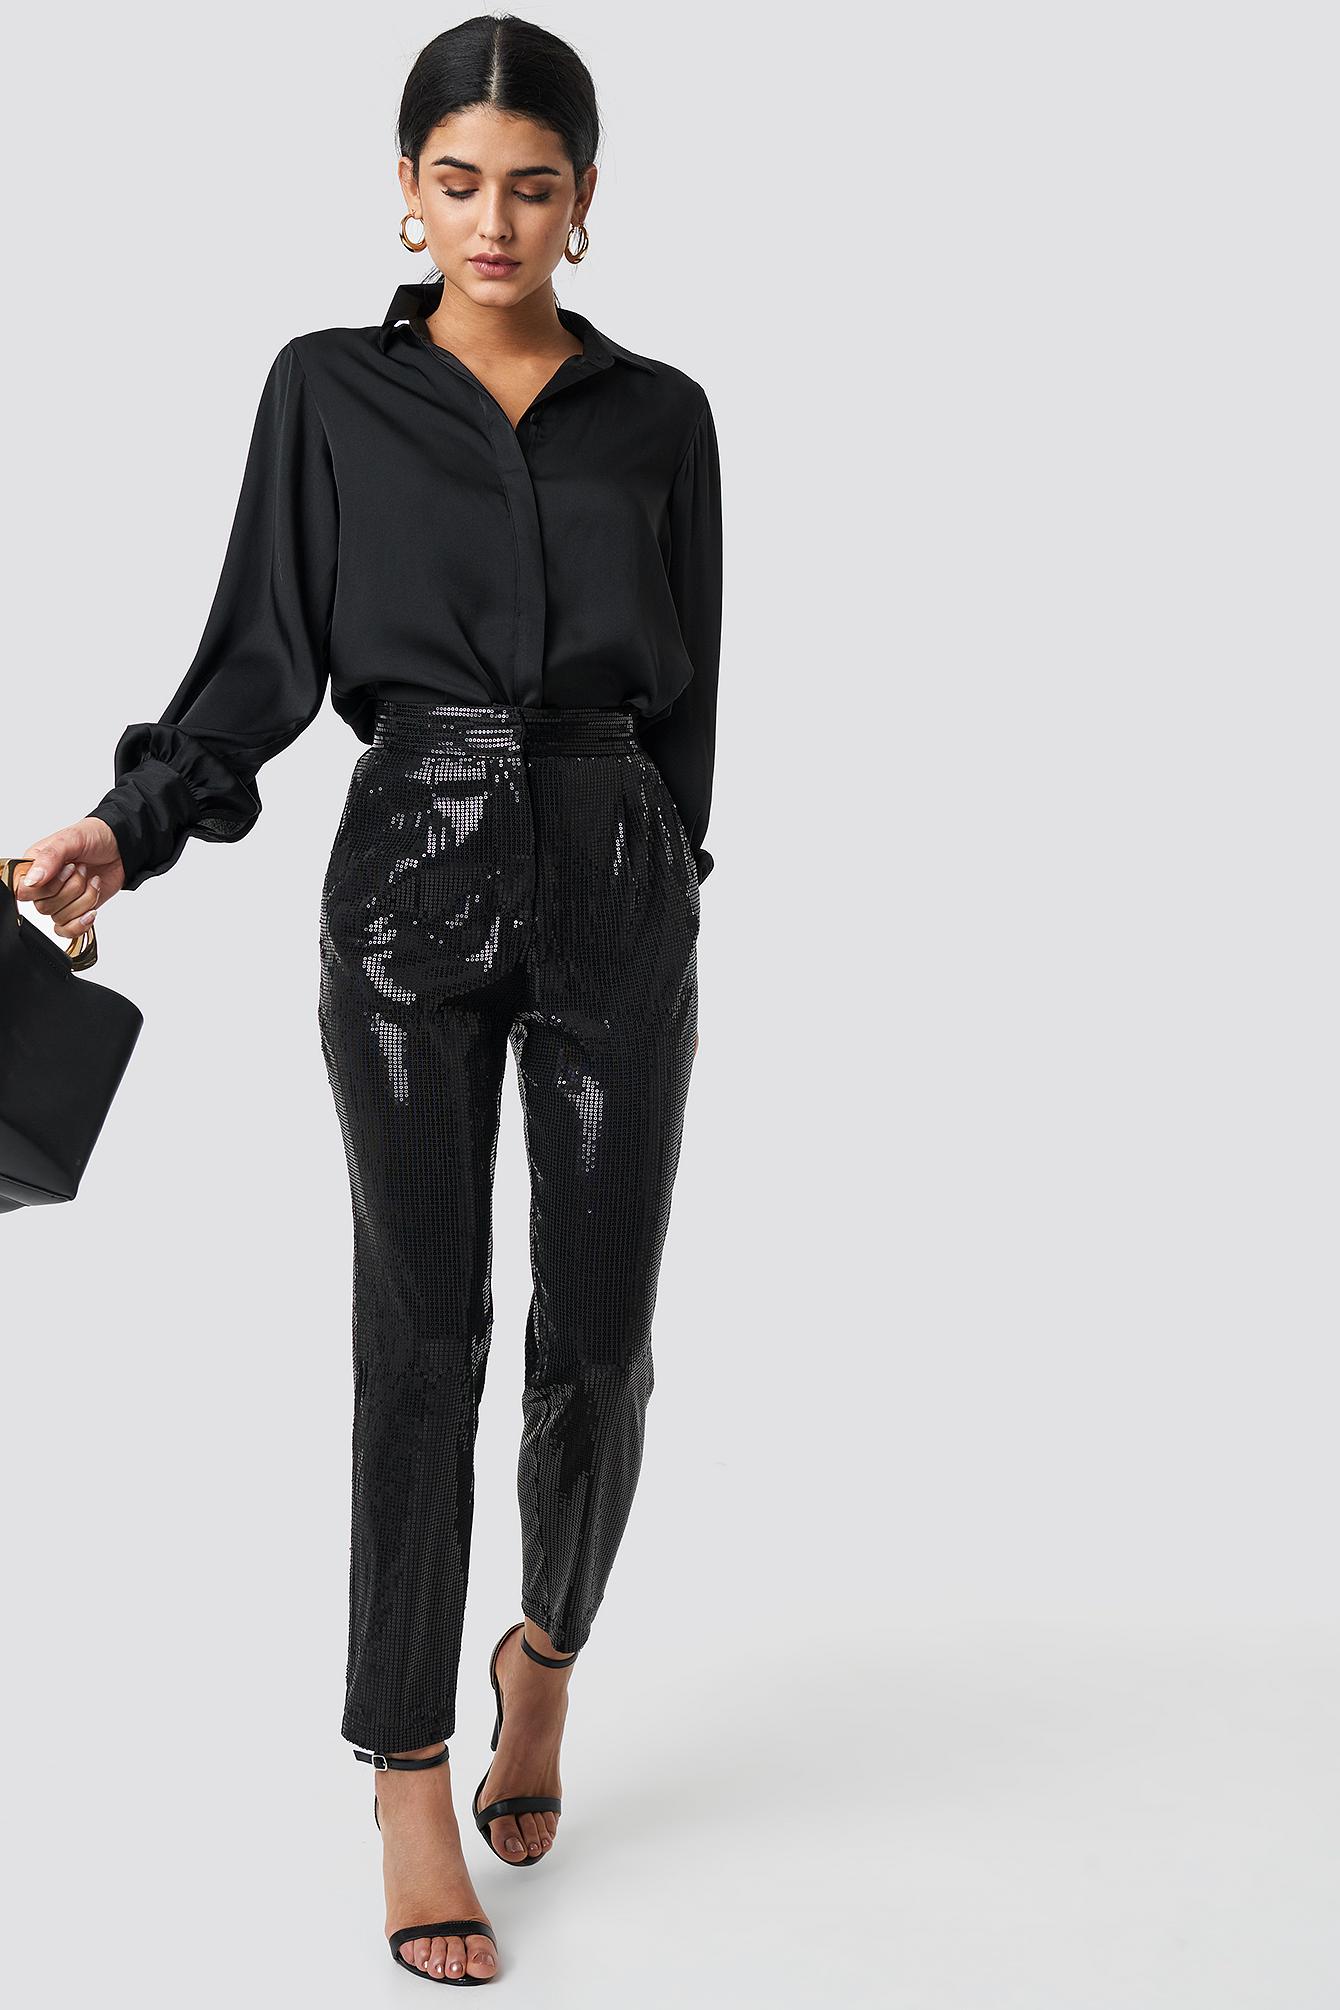 trendyol -  Payet Cropped Pants - Black